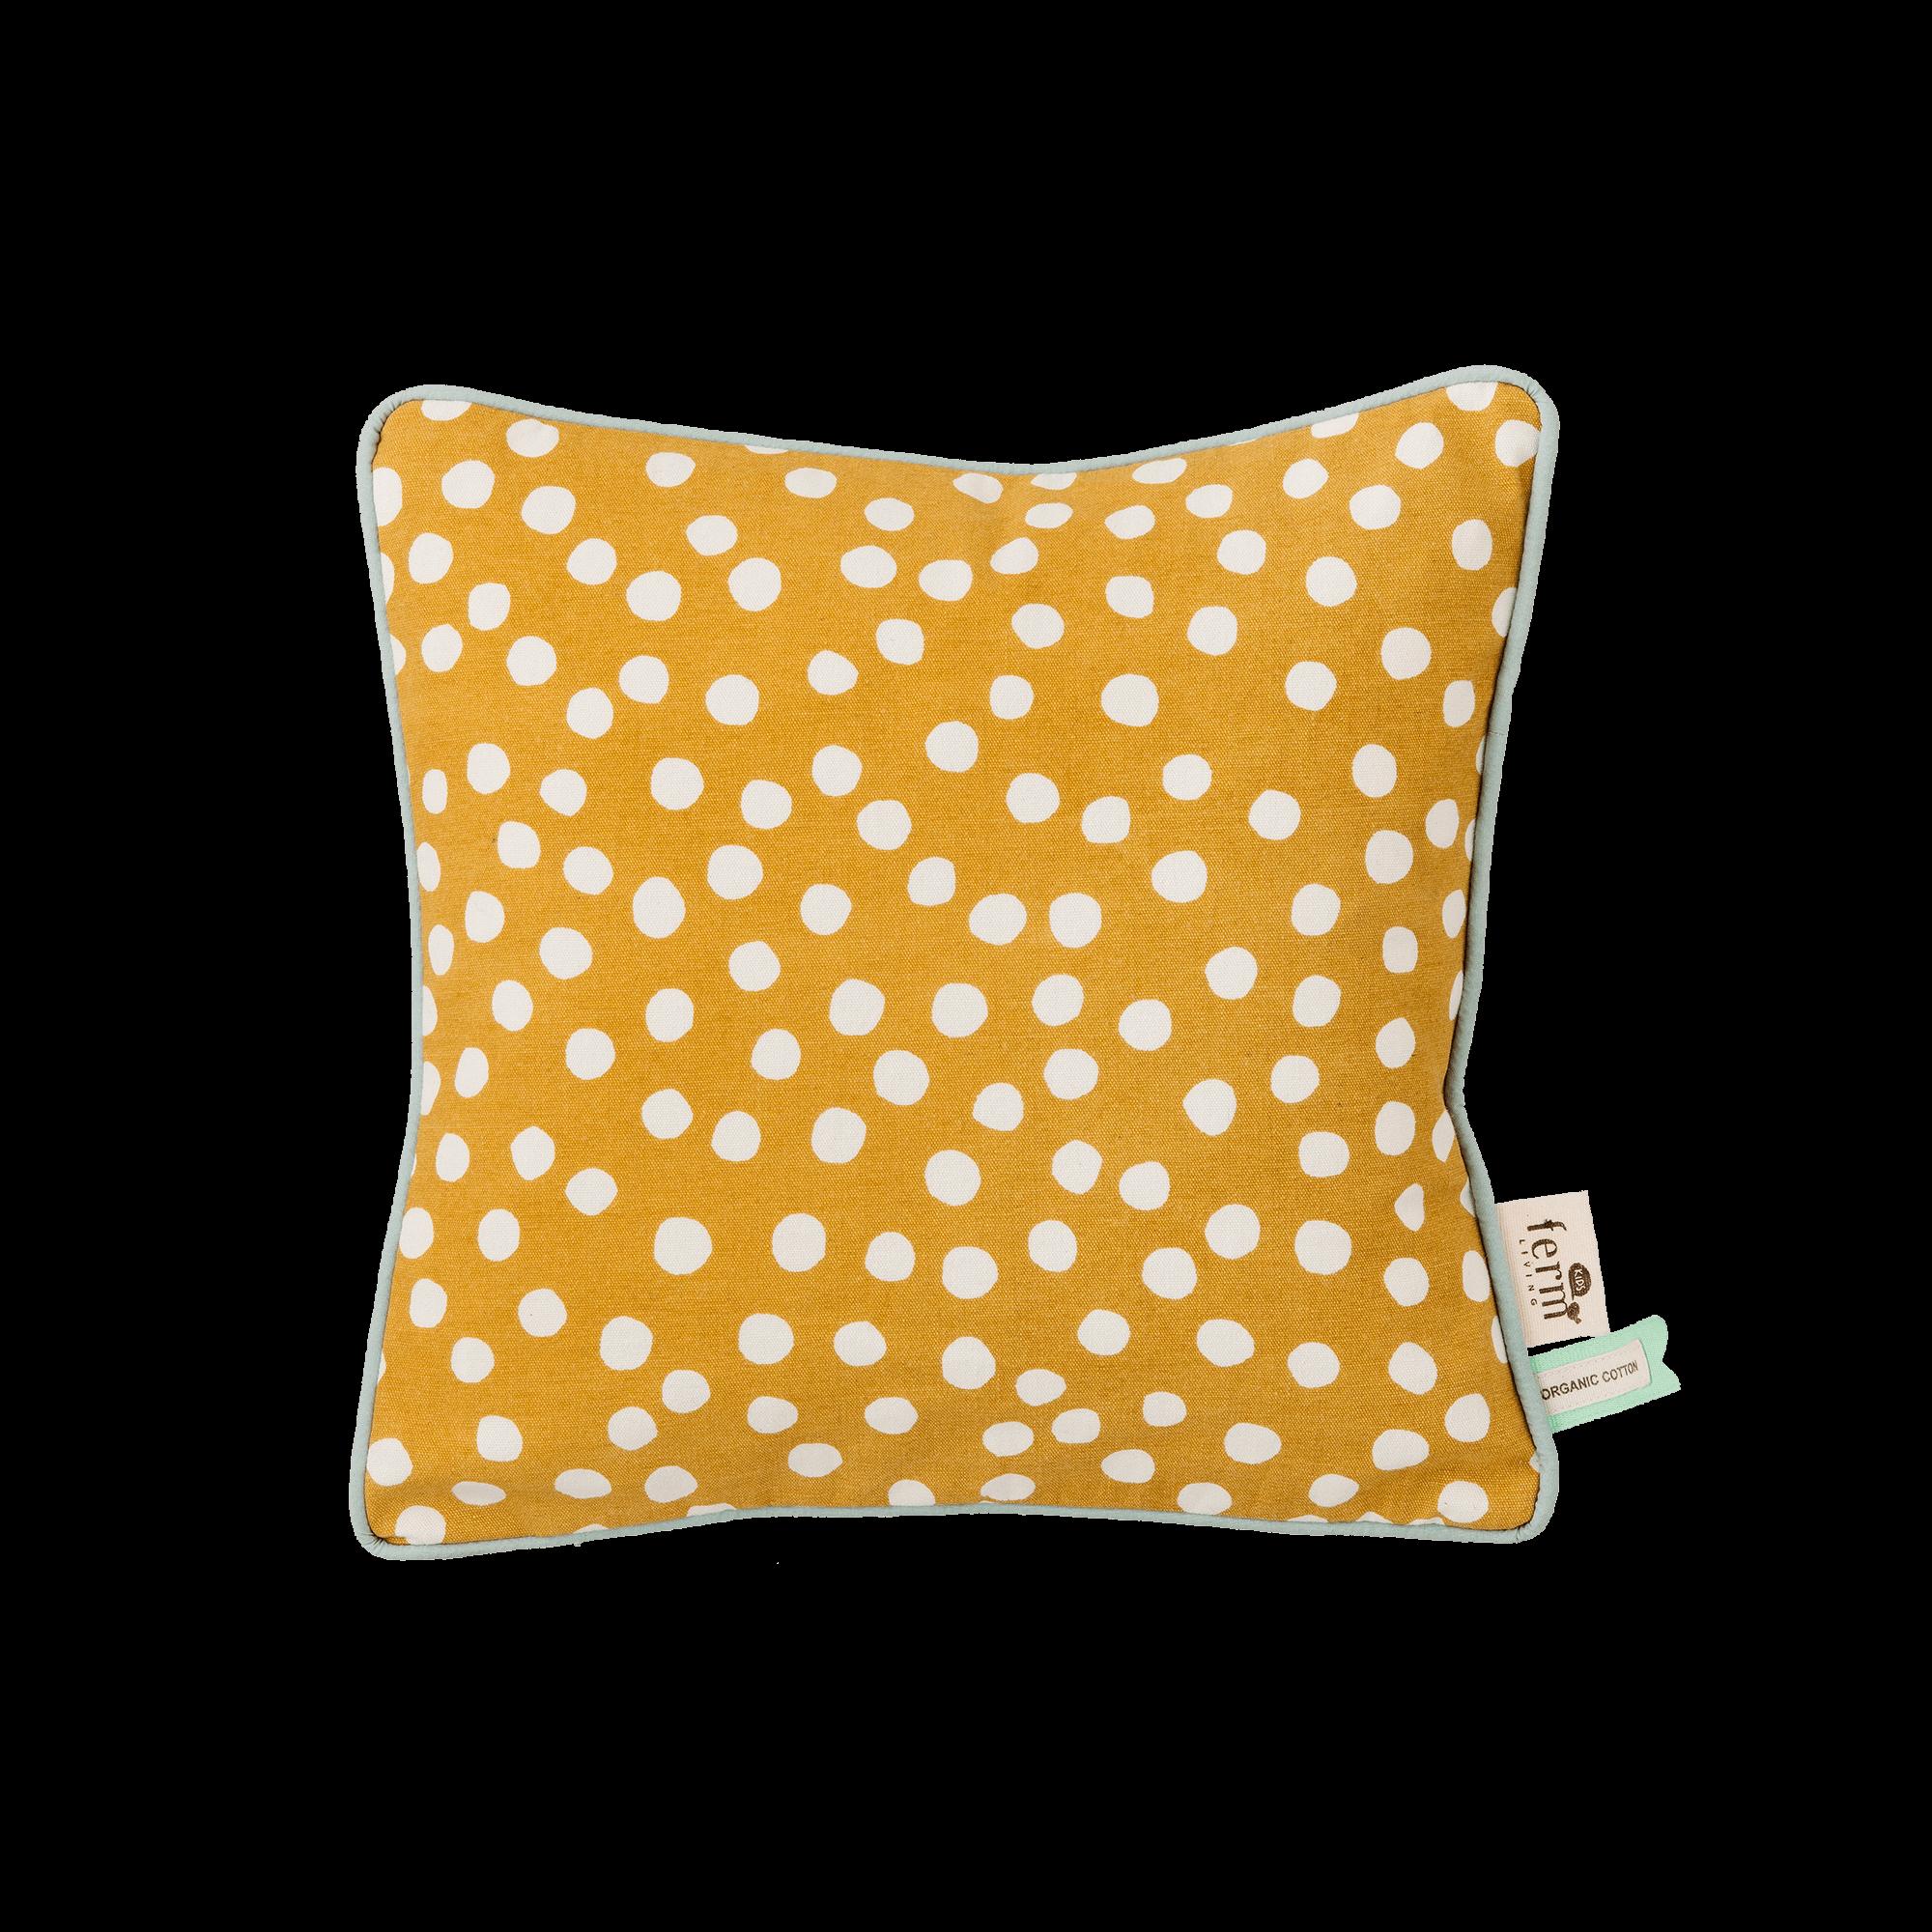 Dots cushion - curry